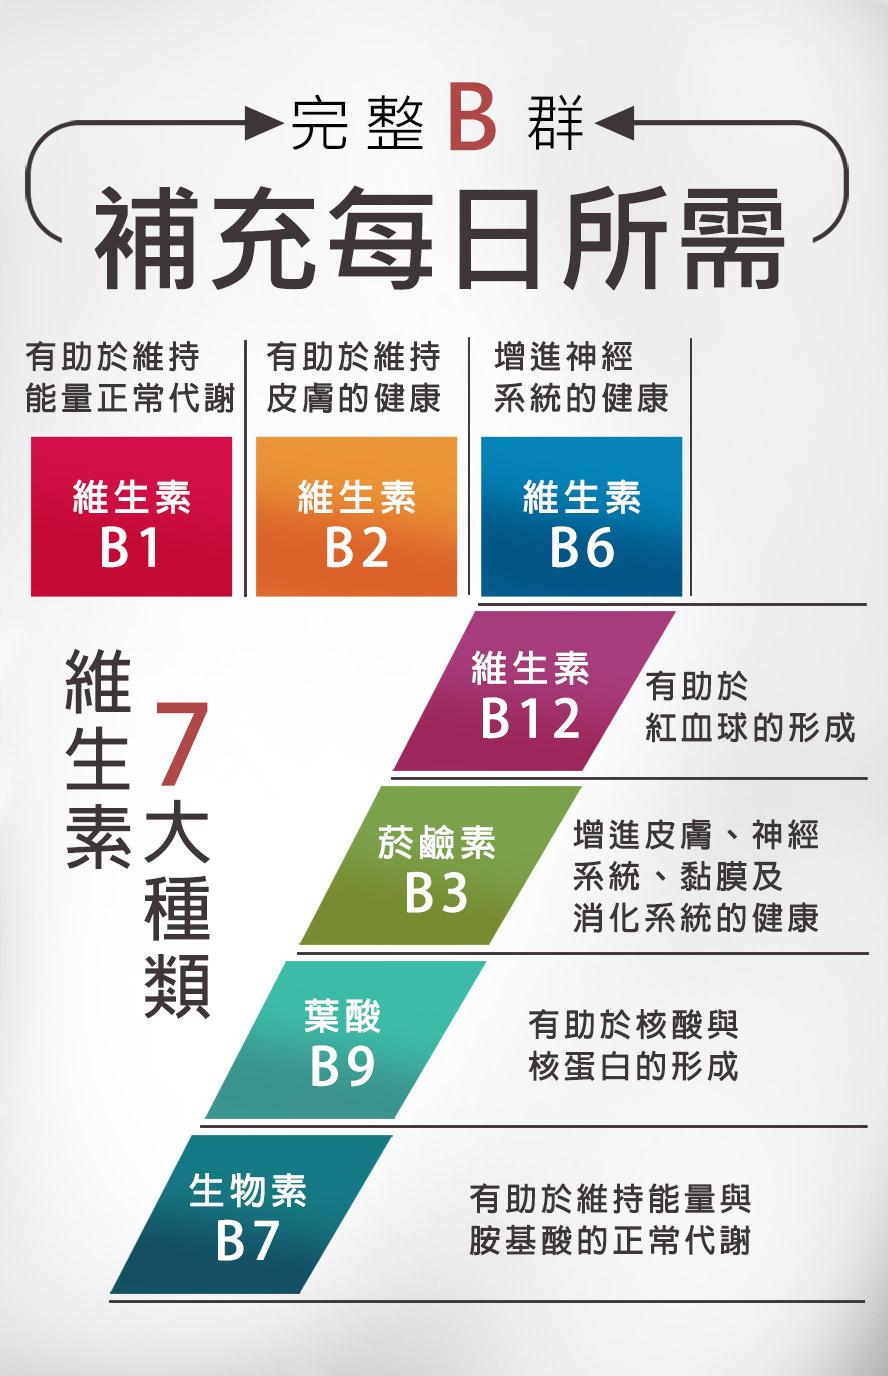 UNIQMANB群+馬卡內涵完整維生素,維他命B1,B2,B6,B12,菸鹼酸,補充整日維生素所需